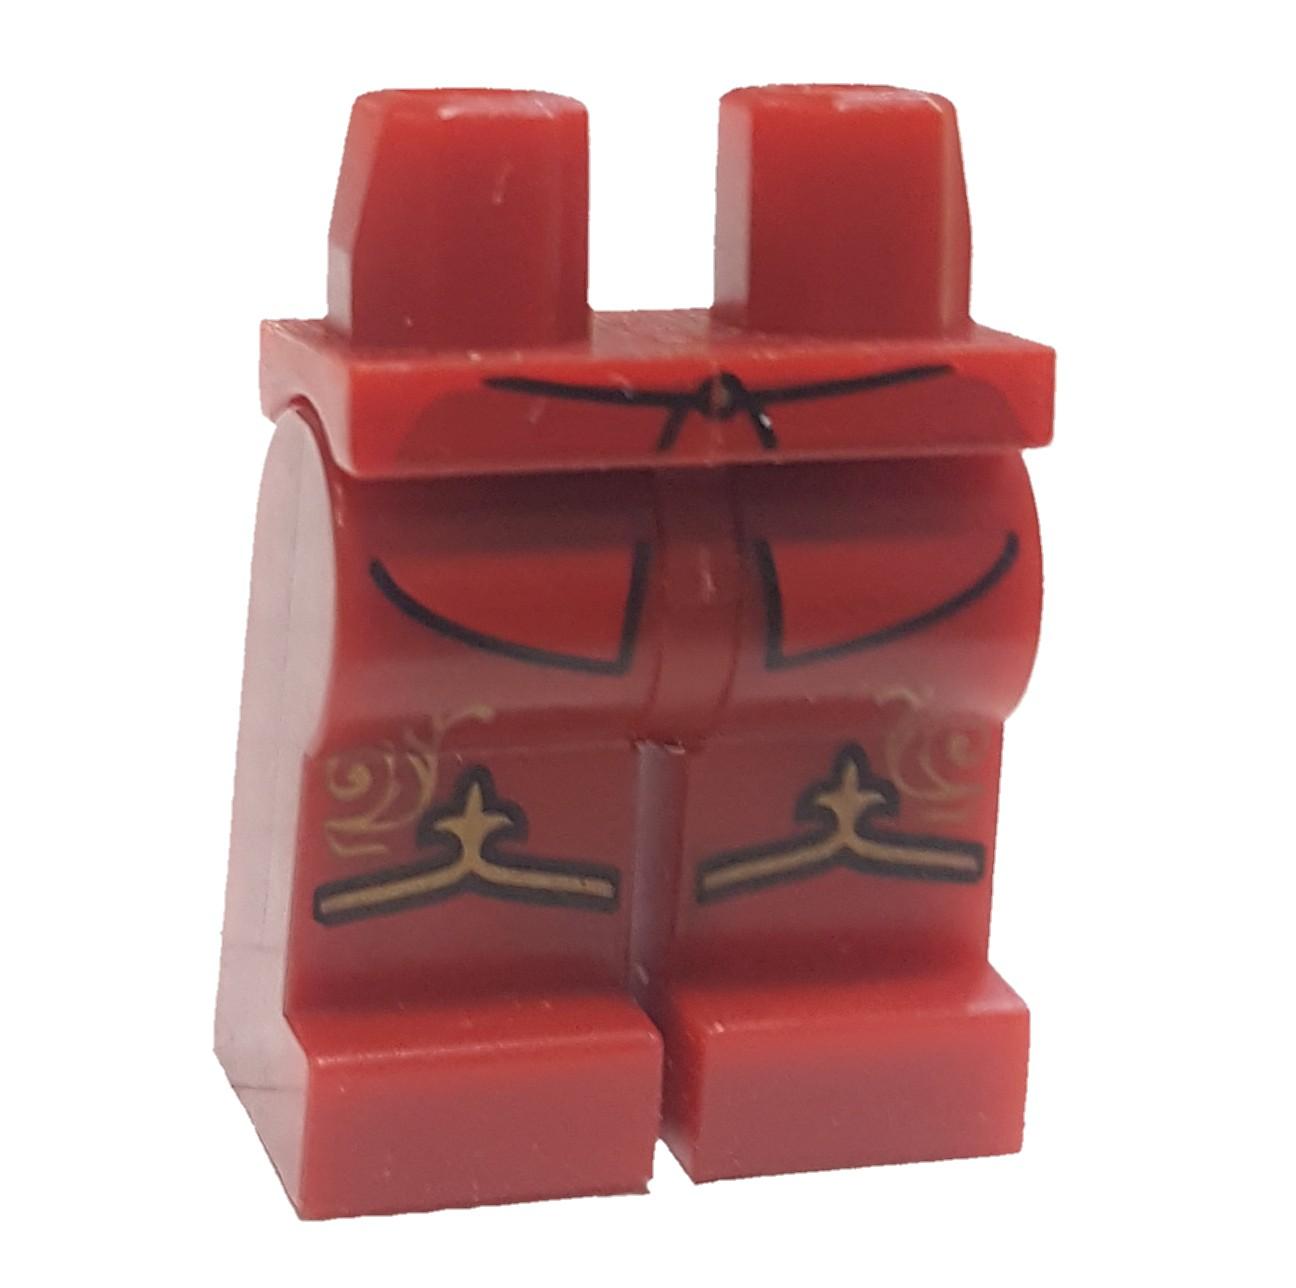 LEGO Dark Red Legs, Shirttails, Gold Band and Fleur de Lis Pattern Loose Legs